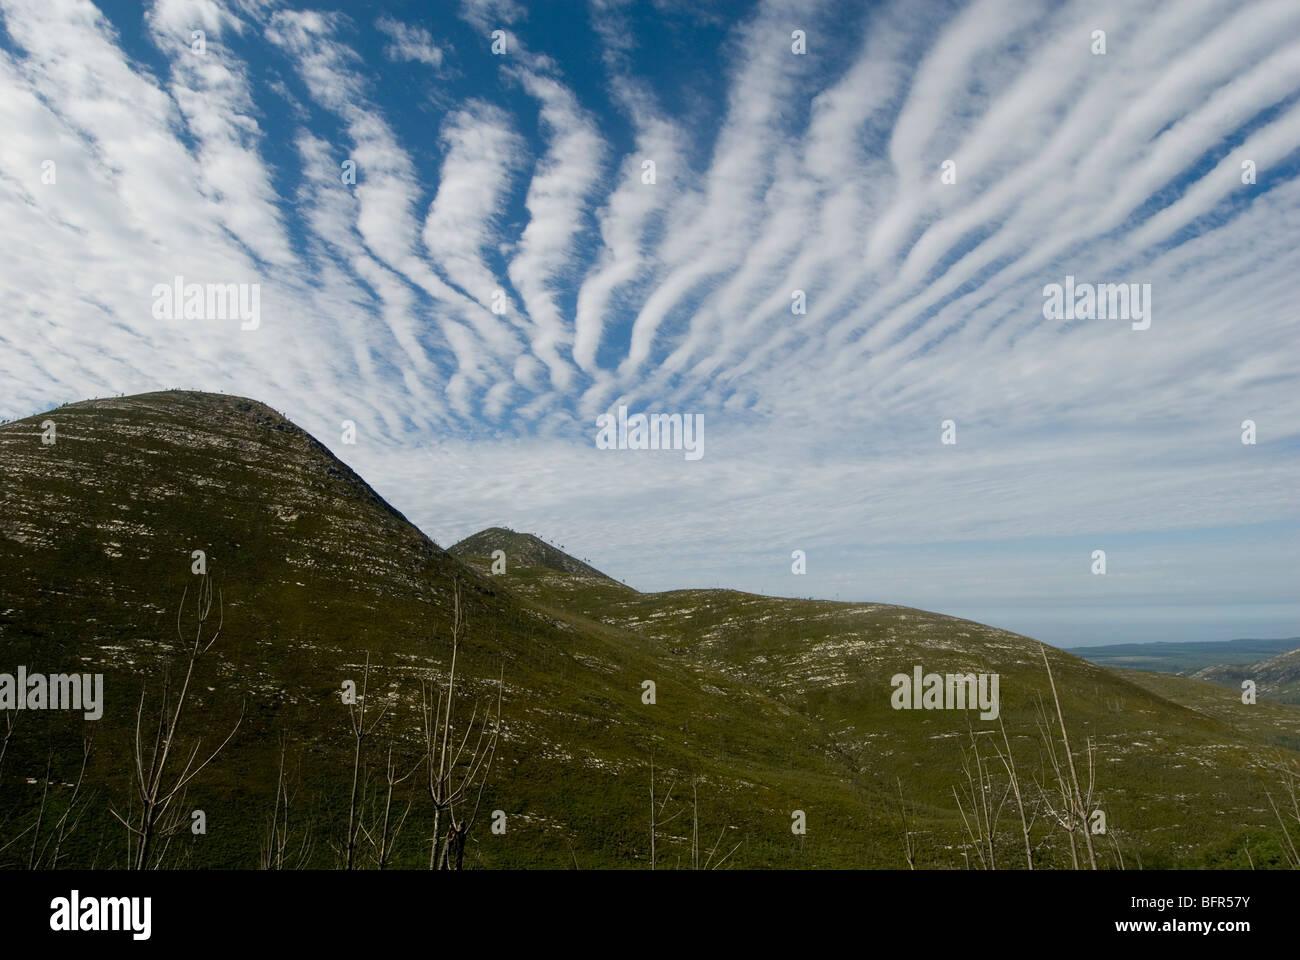 Splendid Pass on the Tsitsikama Hiking Trail with unusual cloud formation - Stock Image